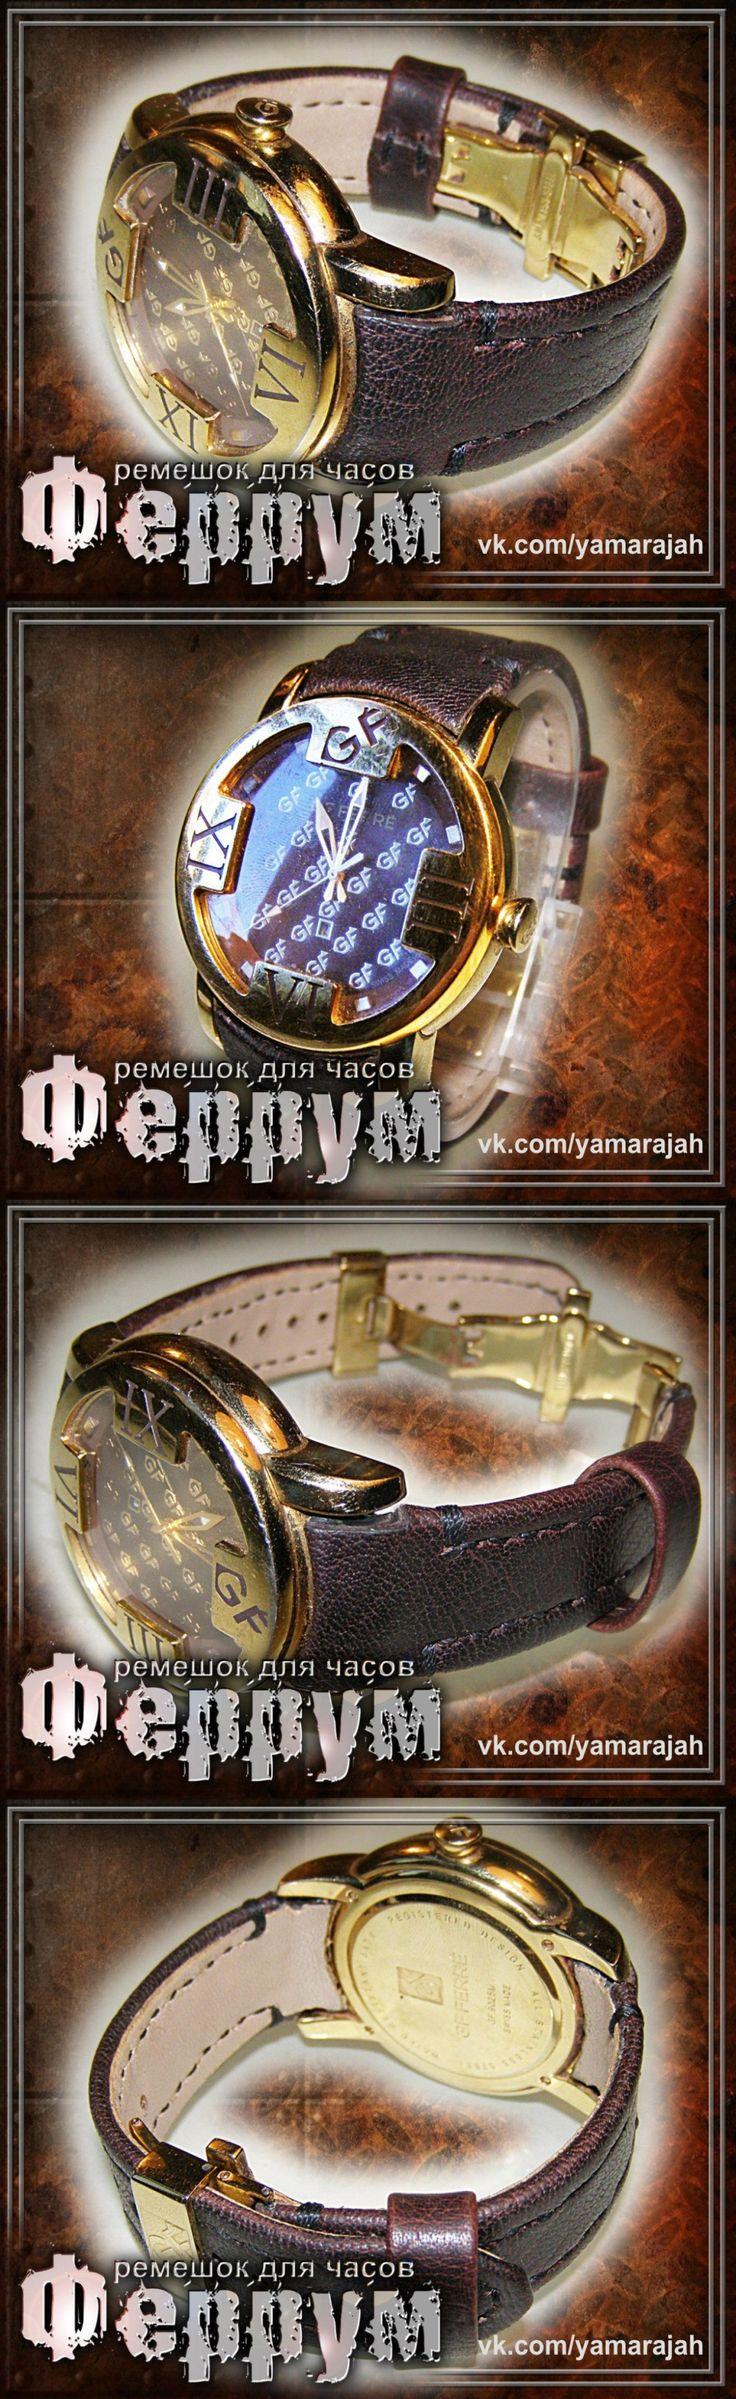 Watchband GF Ferre. Buffalo leather lining, waxed thread firmware in two needles. Ремешок для часов GF Ferre. Буйволиная кожа, подклад, прошивка вощеной нитью в две иглы.